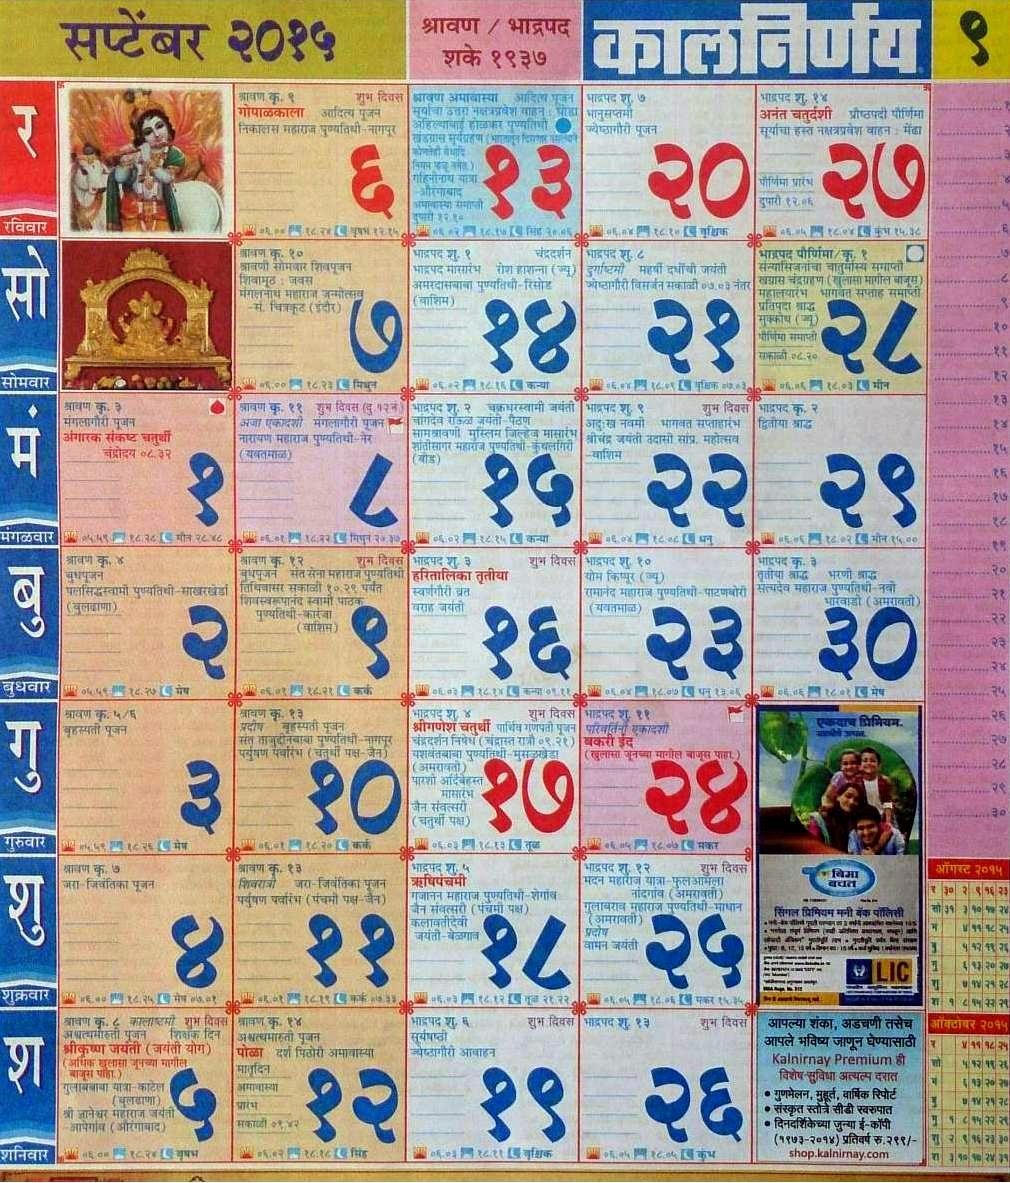 Marathi calendar 2013 free pdf download Click Here